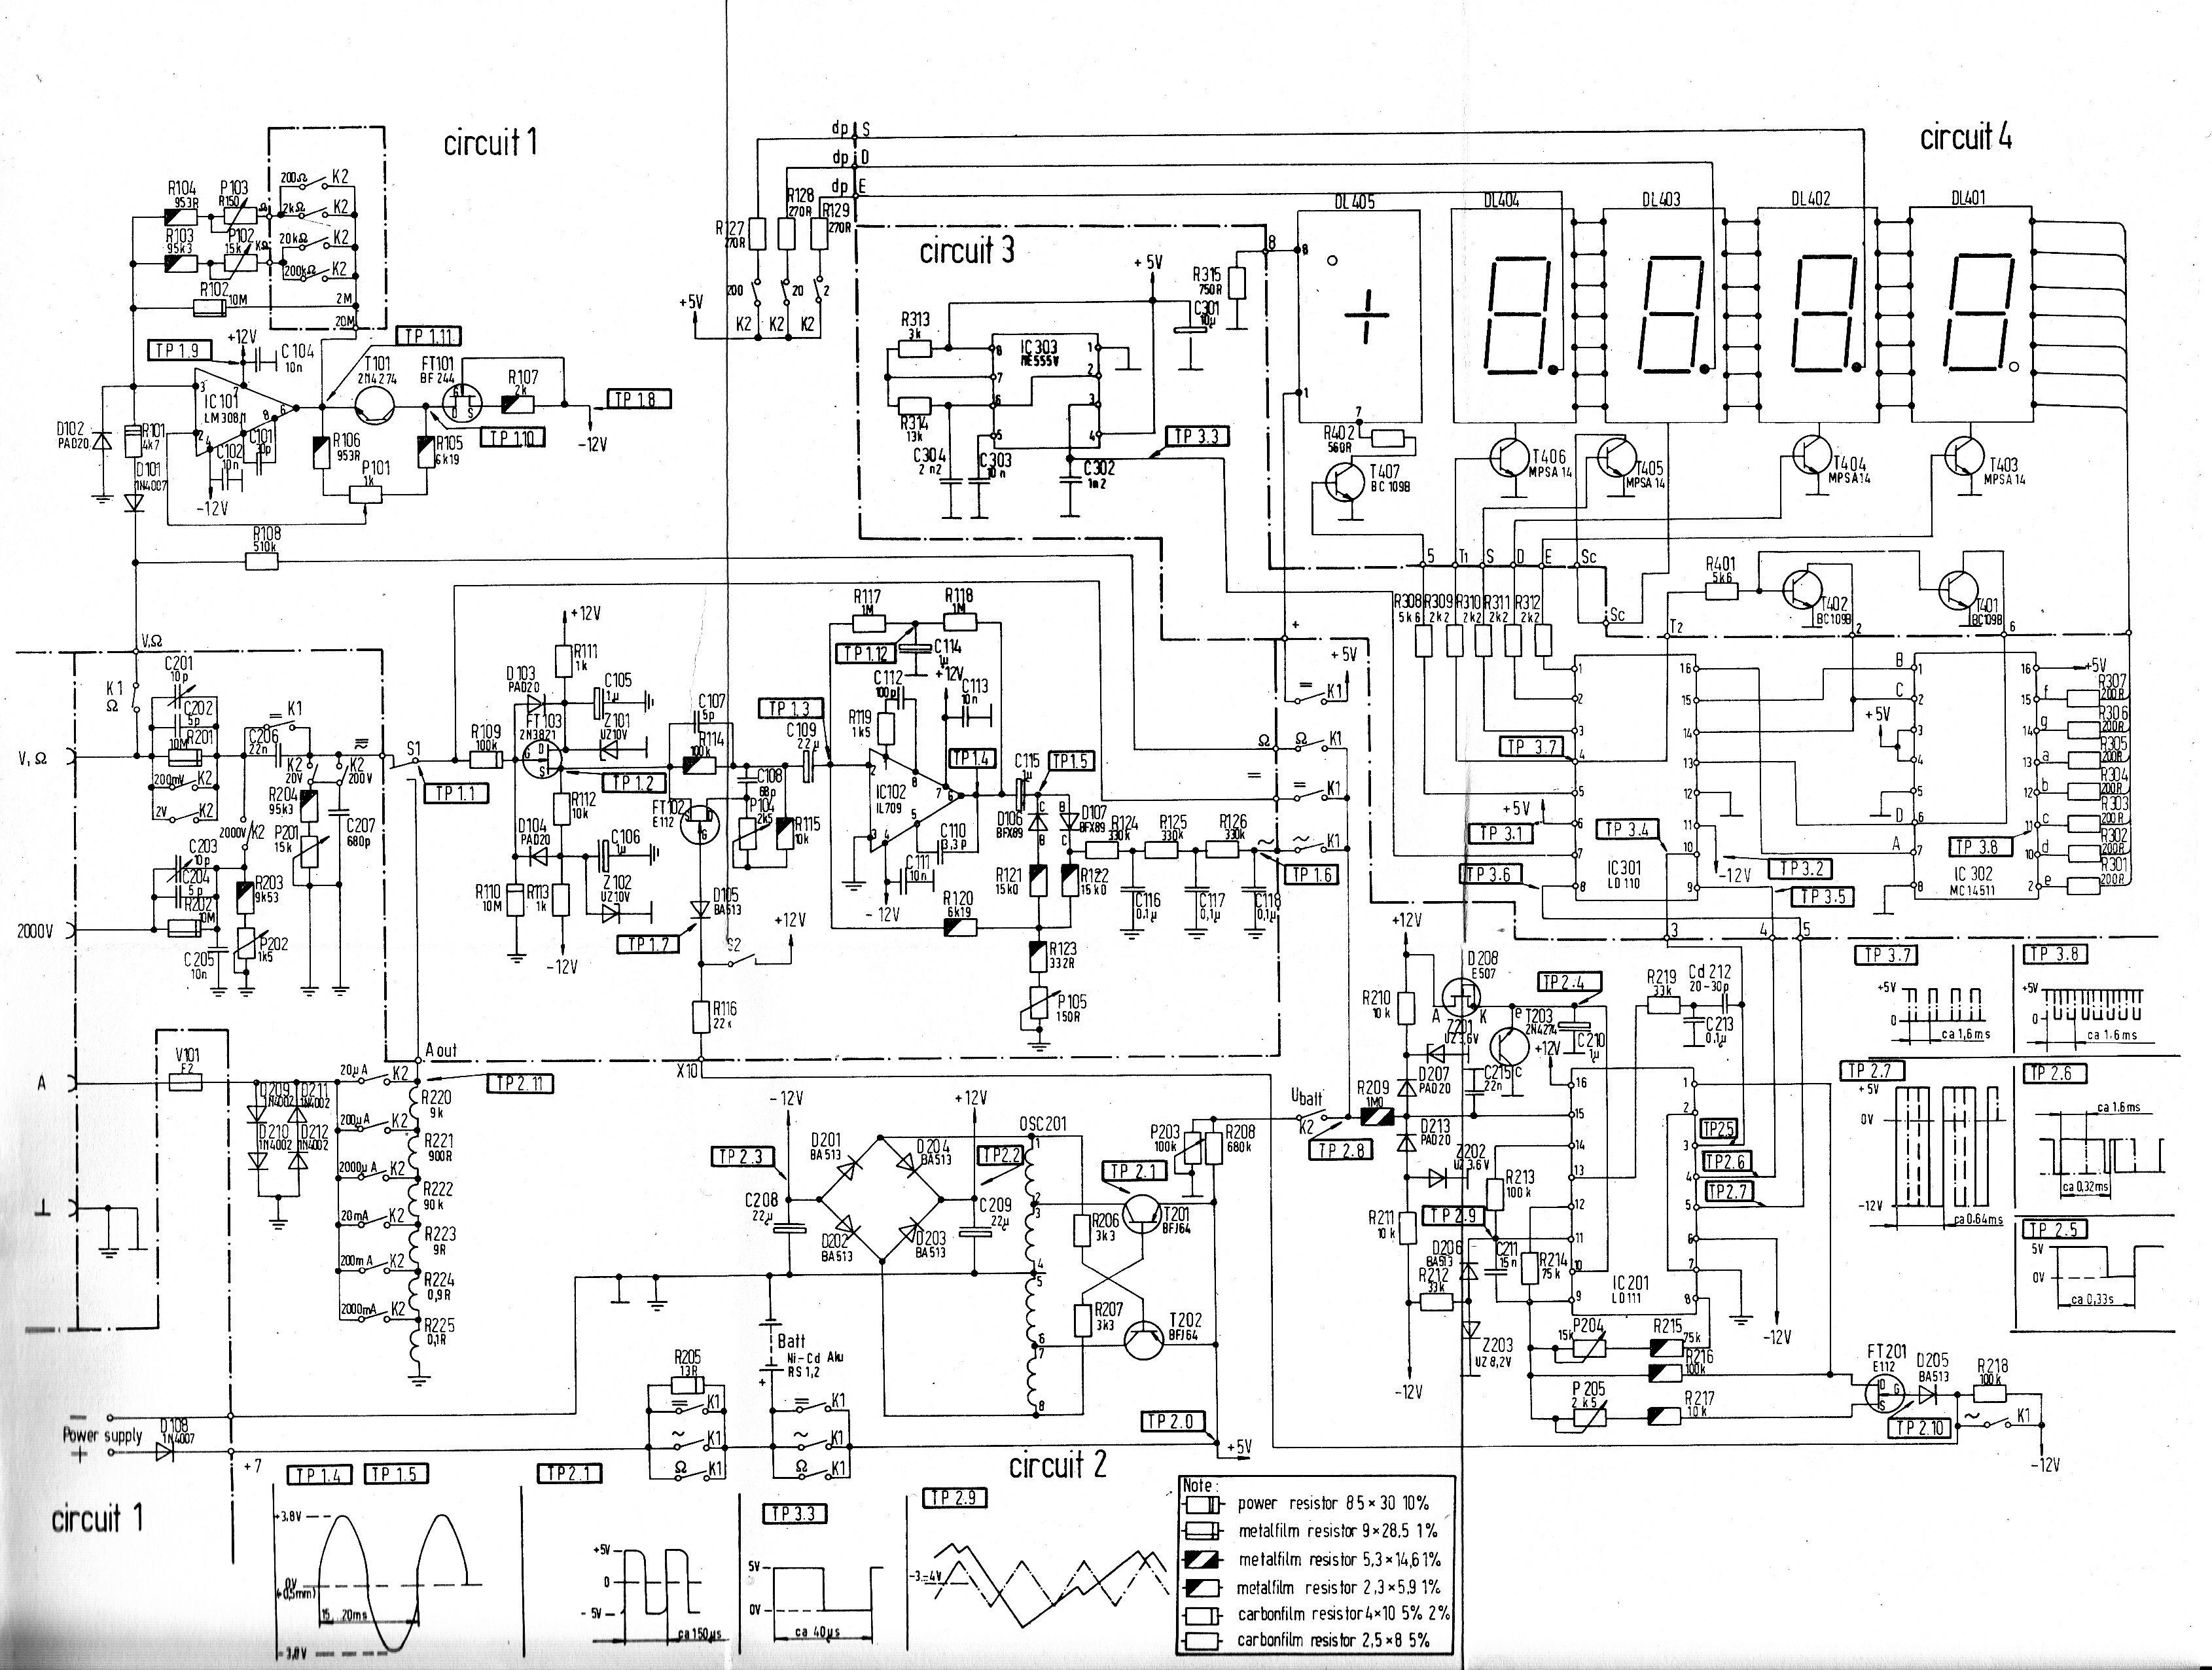 Eevblog 482 Retro Iskra Multimeter Teardown Page 1 Digital Voltmeter Circuit Schematic Http Farm6staticflickrcom 5341 9018886137 3c72fc2089 O